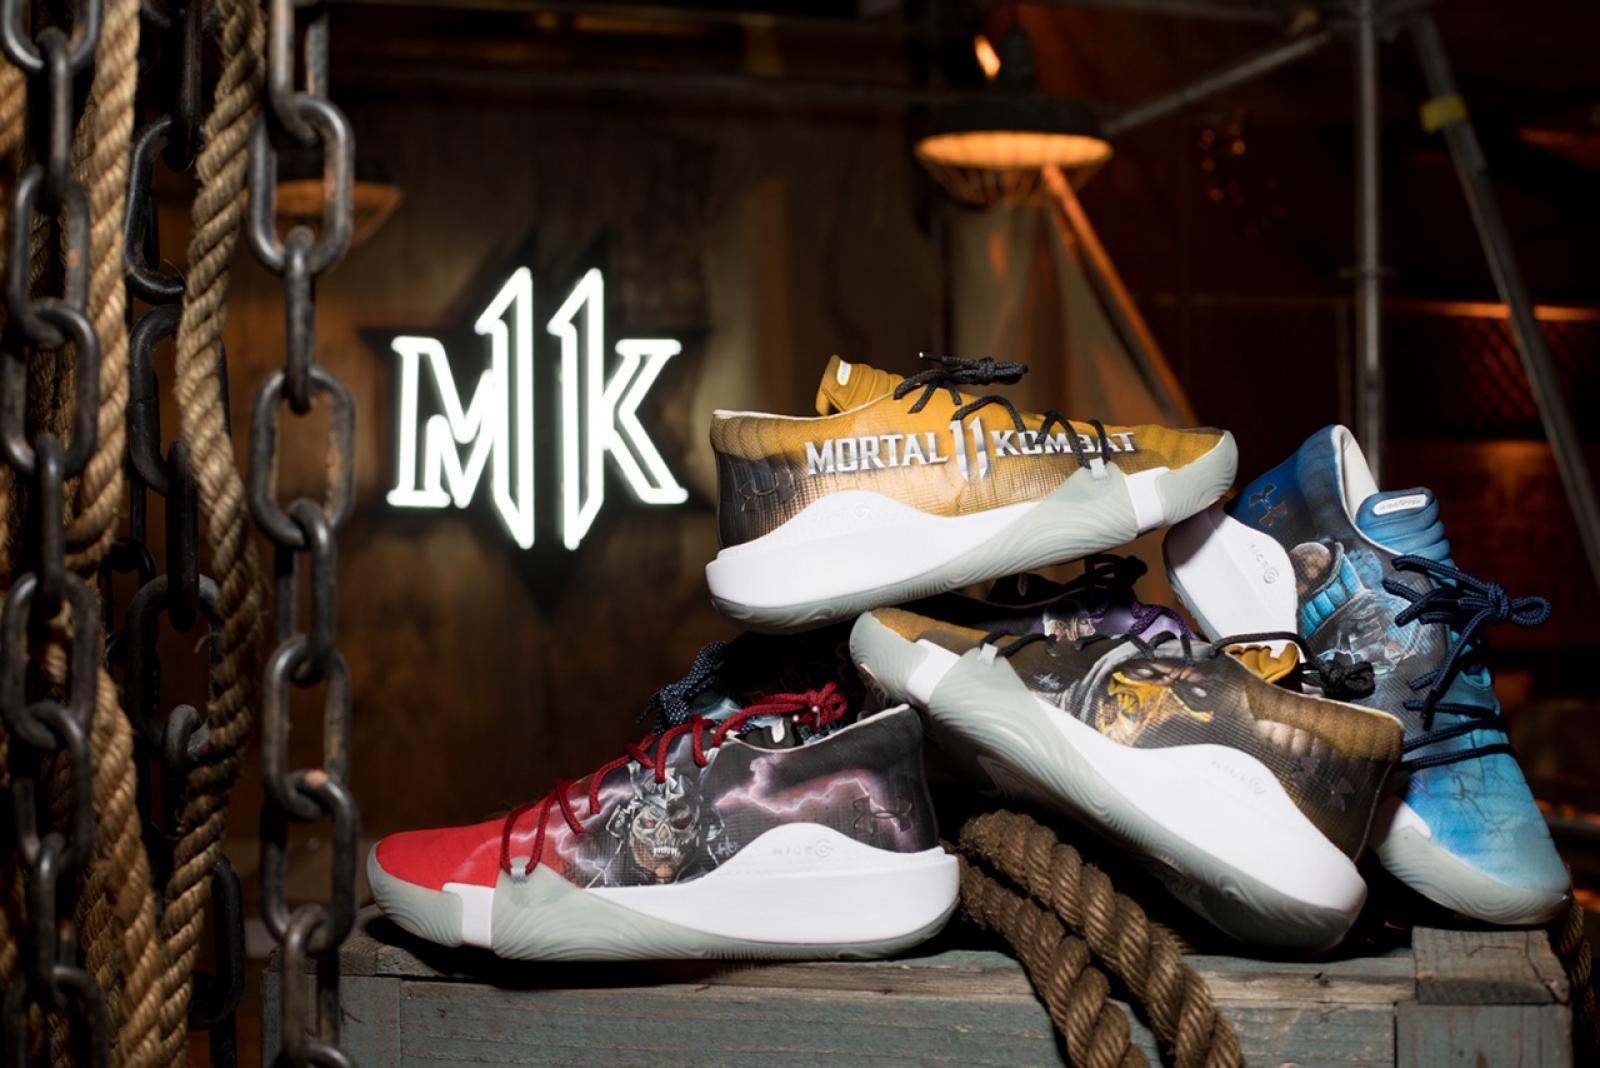 Decoración tristeza reserva  Under Armour and Mortal Kombat Deliver a Footwear Fatality c/o Mache  Customs | RESPECT.